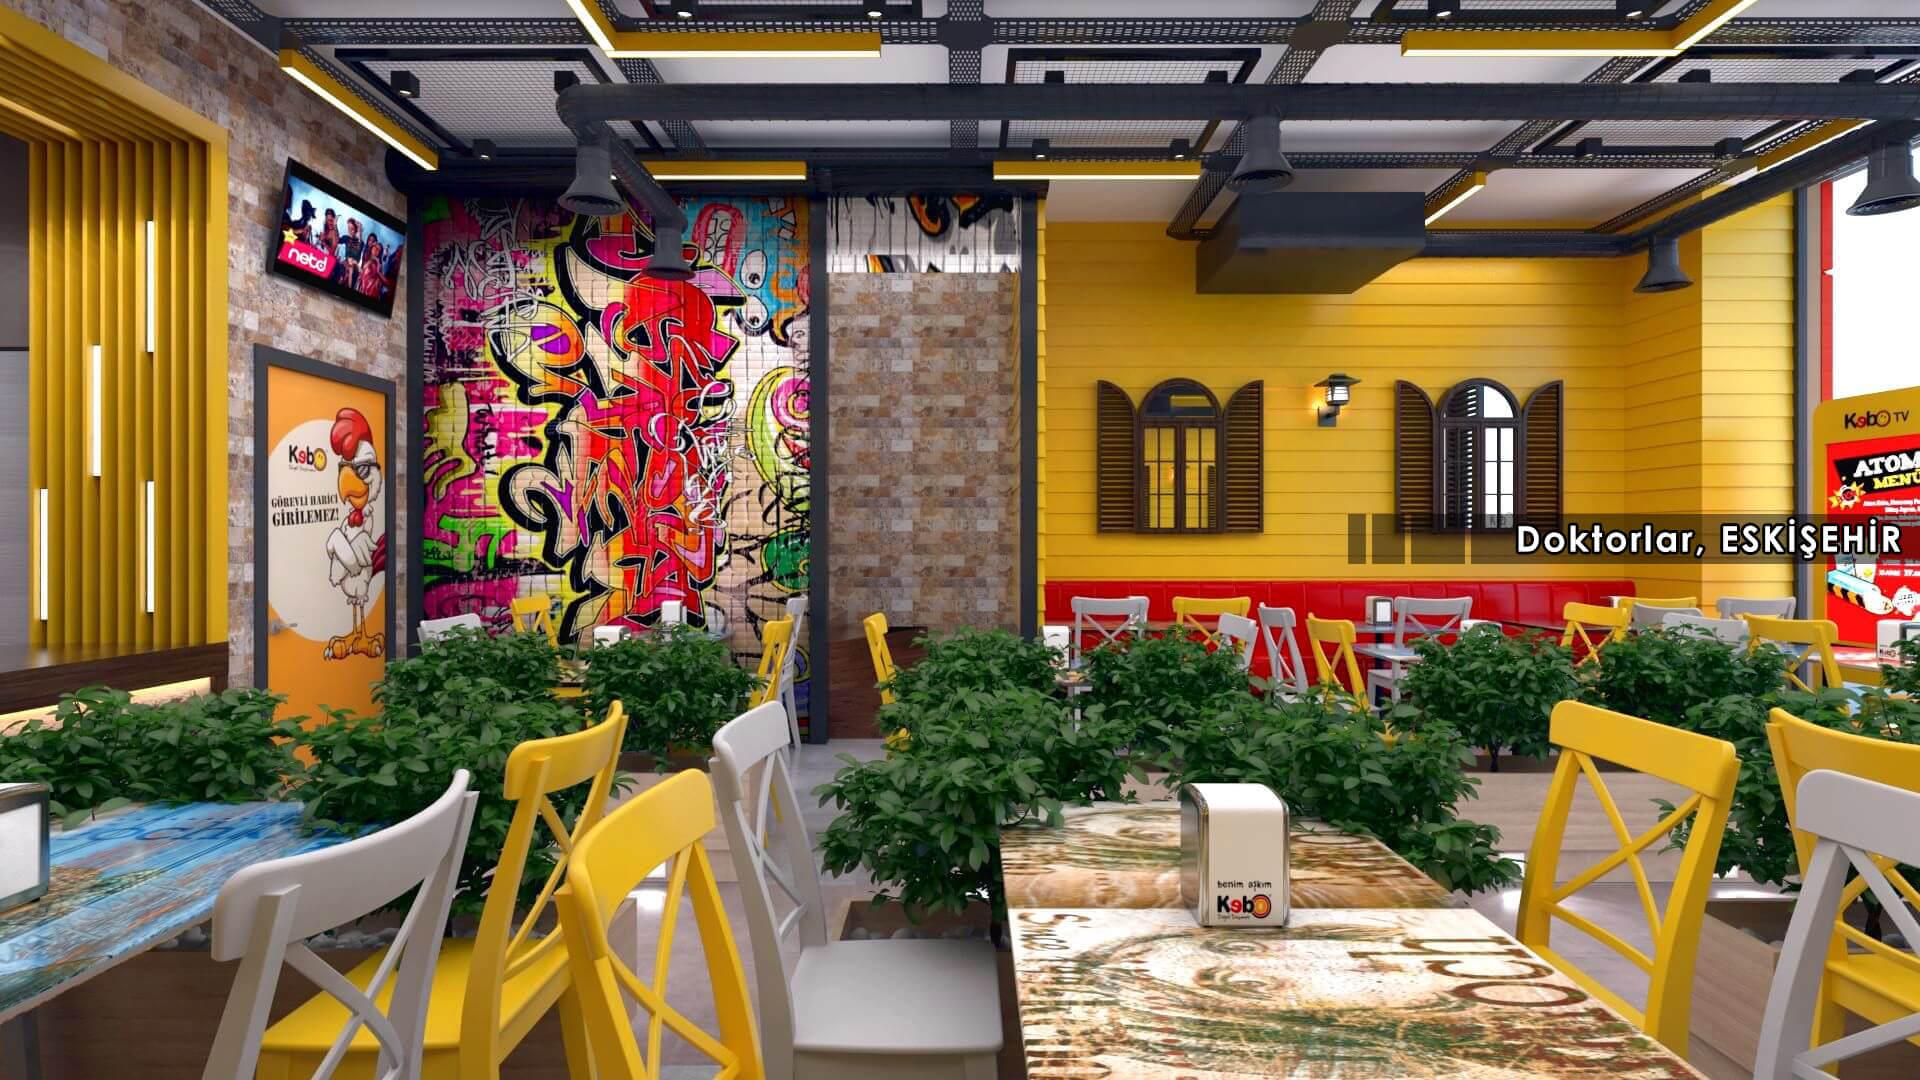 Restoran, Cafe, Fast-food Mimari Projeler Kebo 2018